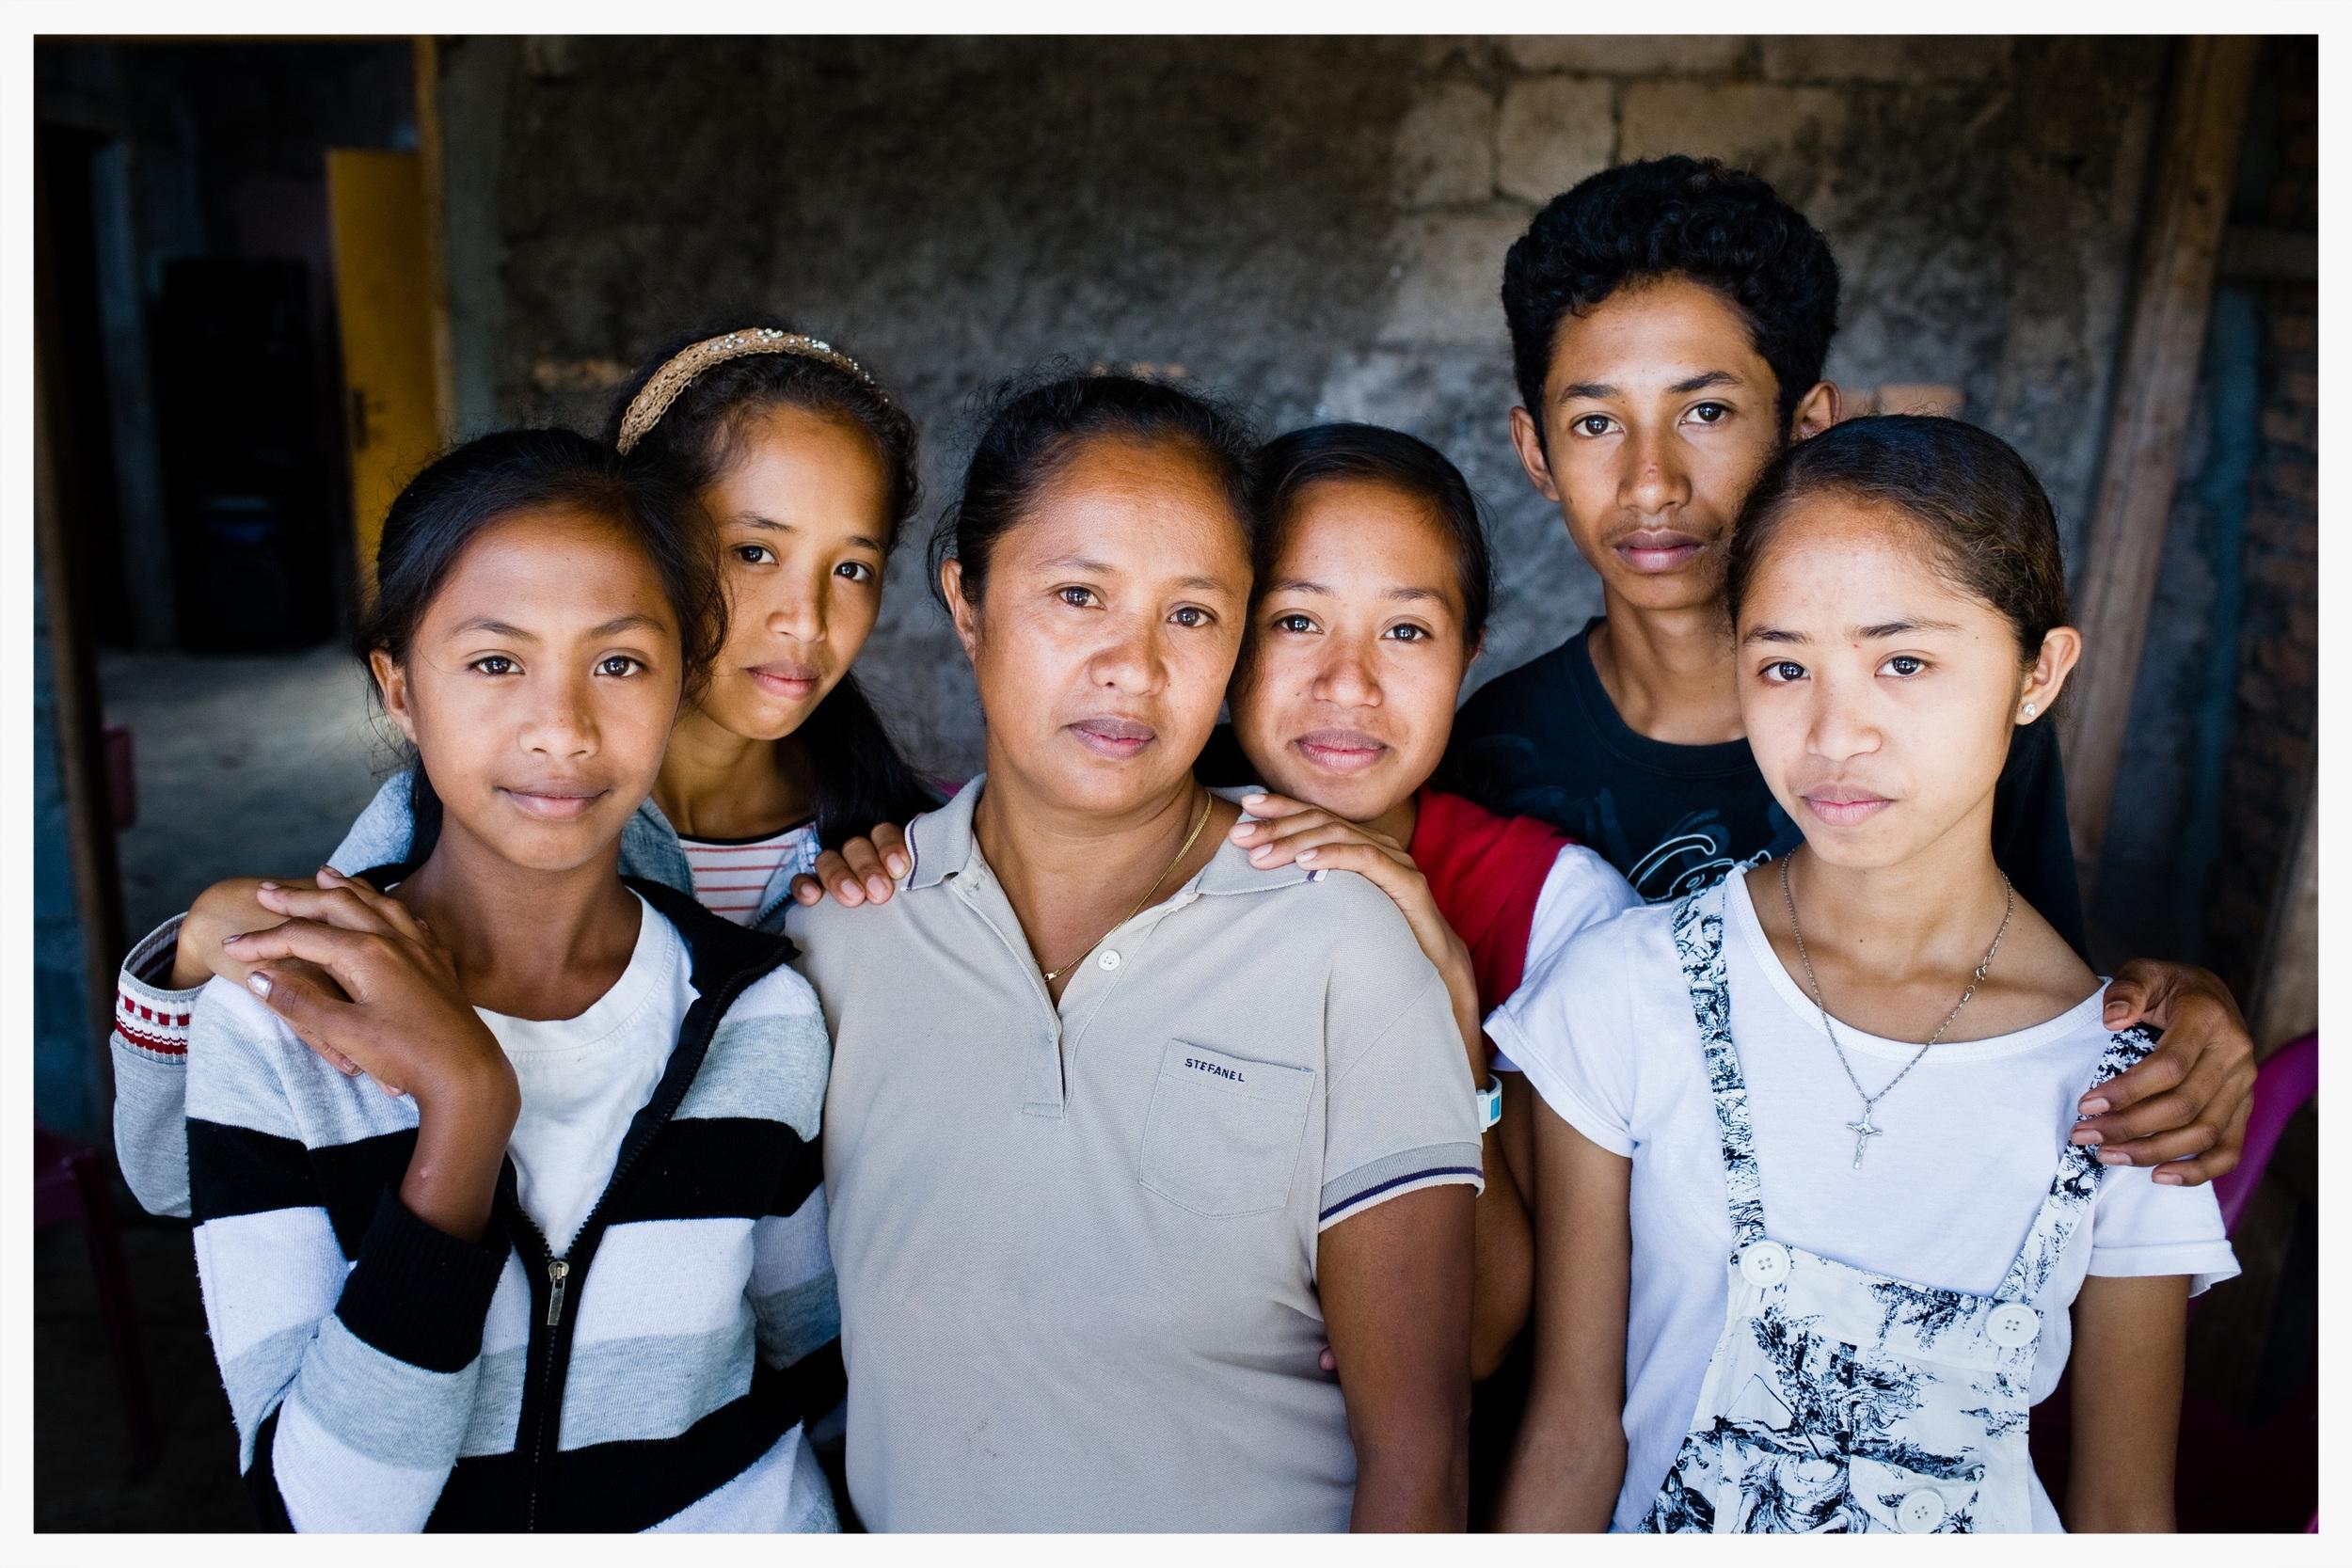 Jelia Boavida de Jesus at home with her children.East Timor.Photo: © Marcus Perkins